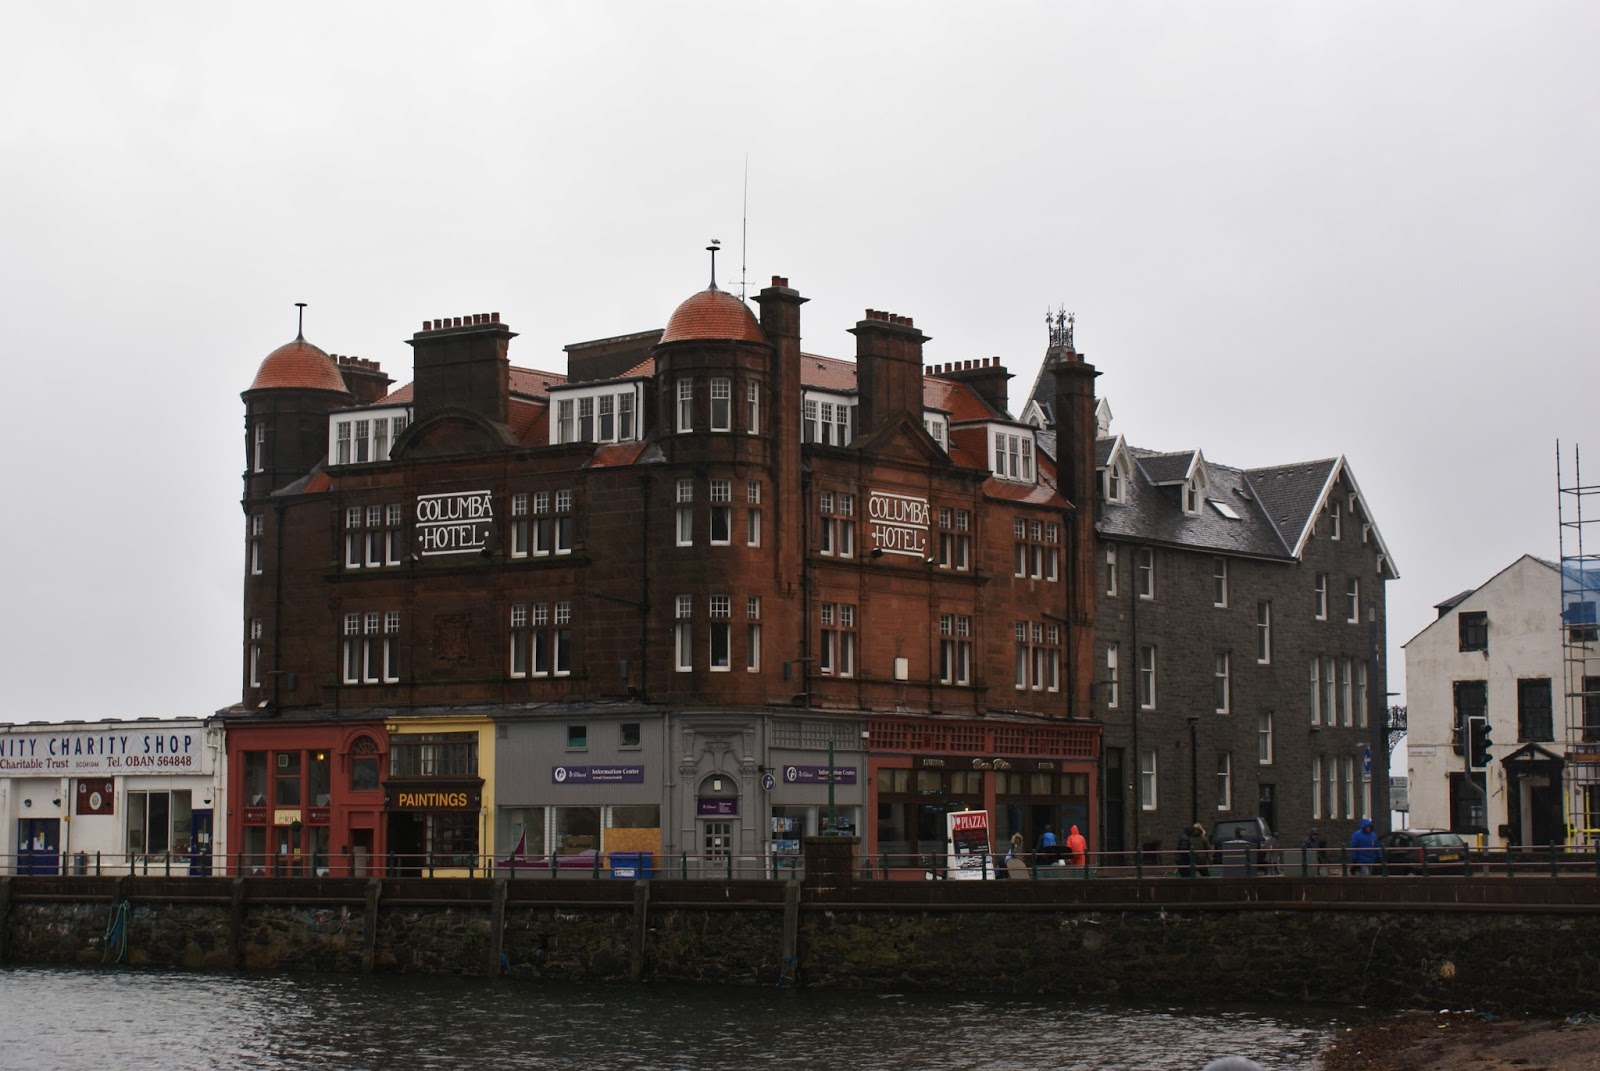 columba hotel oban argyll highlands scotland uk great britain camomille blend